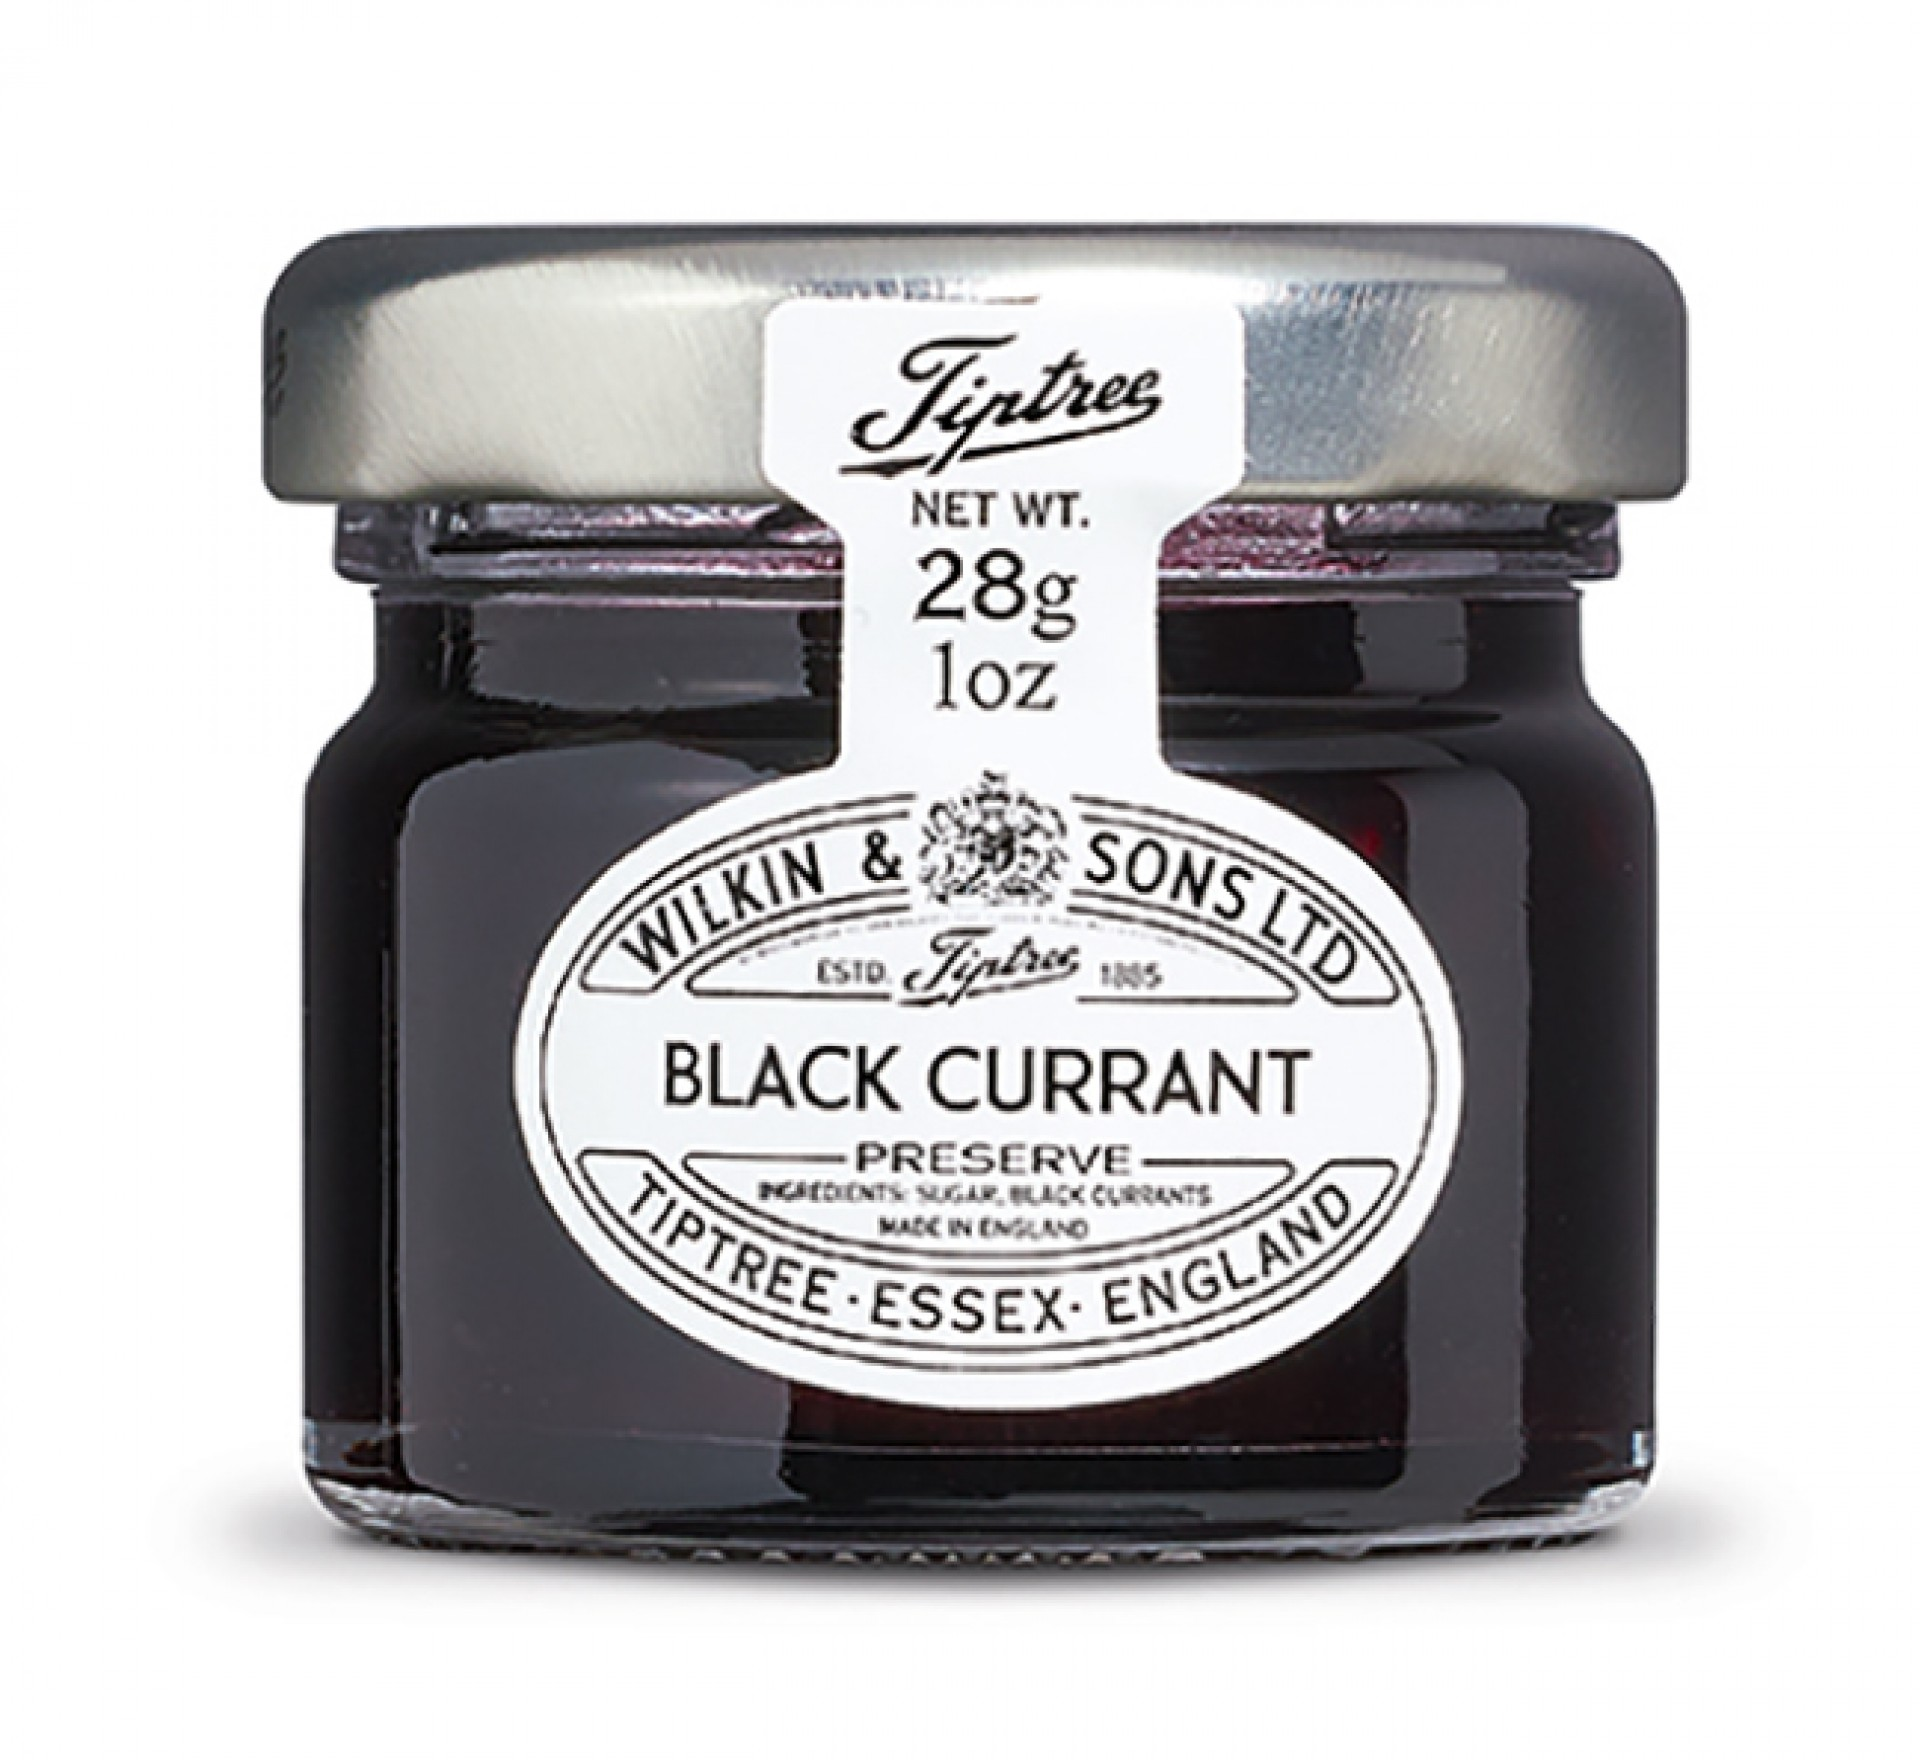 Tiptree Blackcurrant Preserve